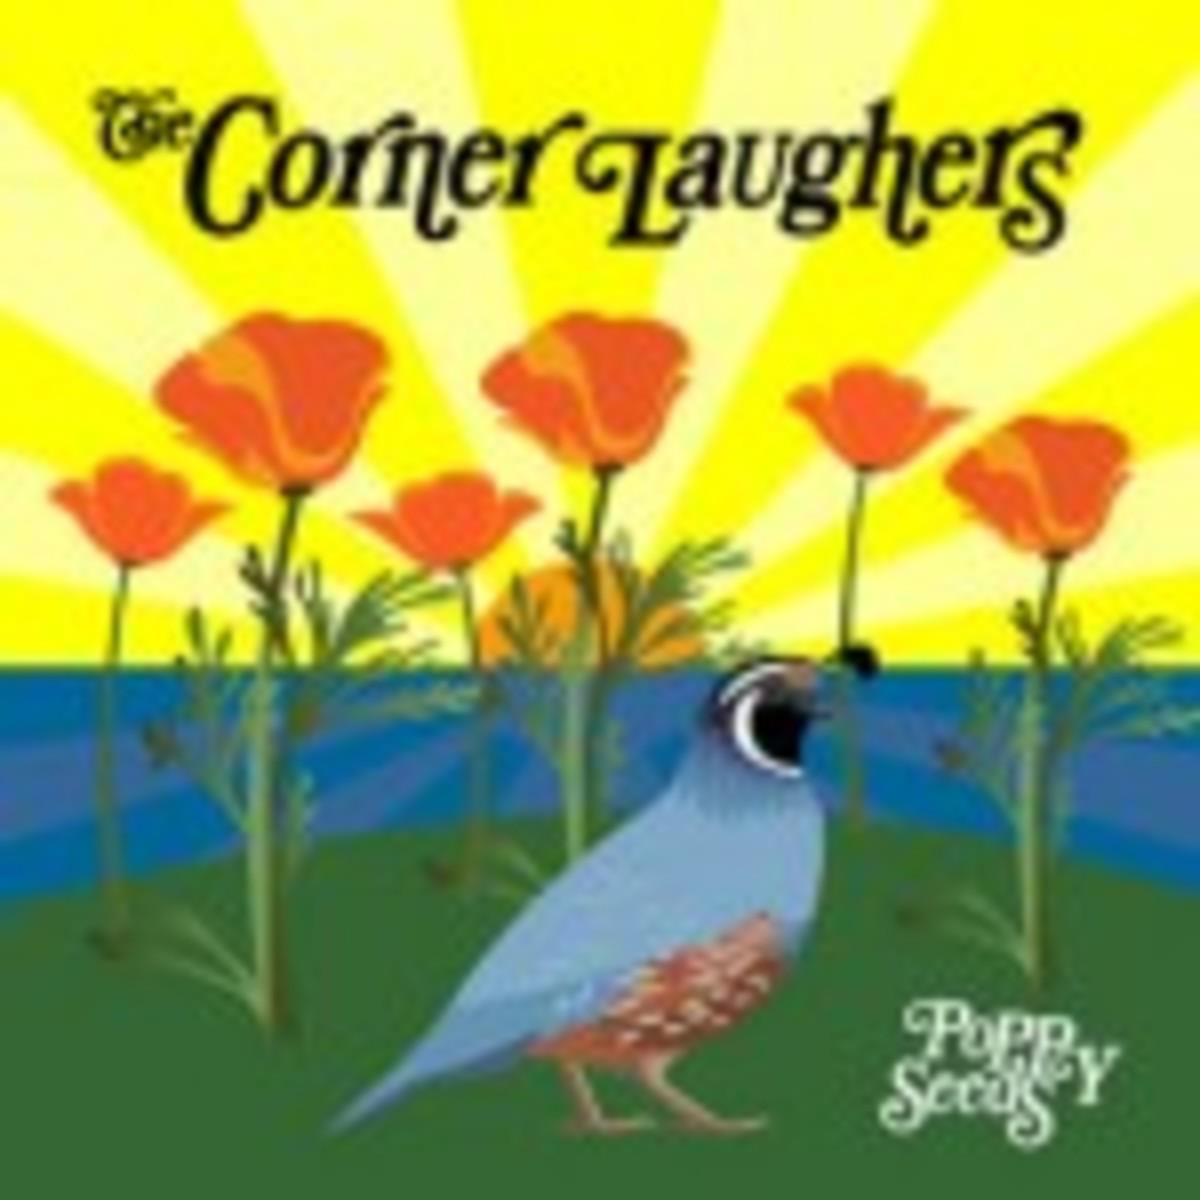 corner_laughers_poppy_seeds